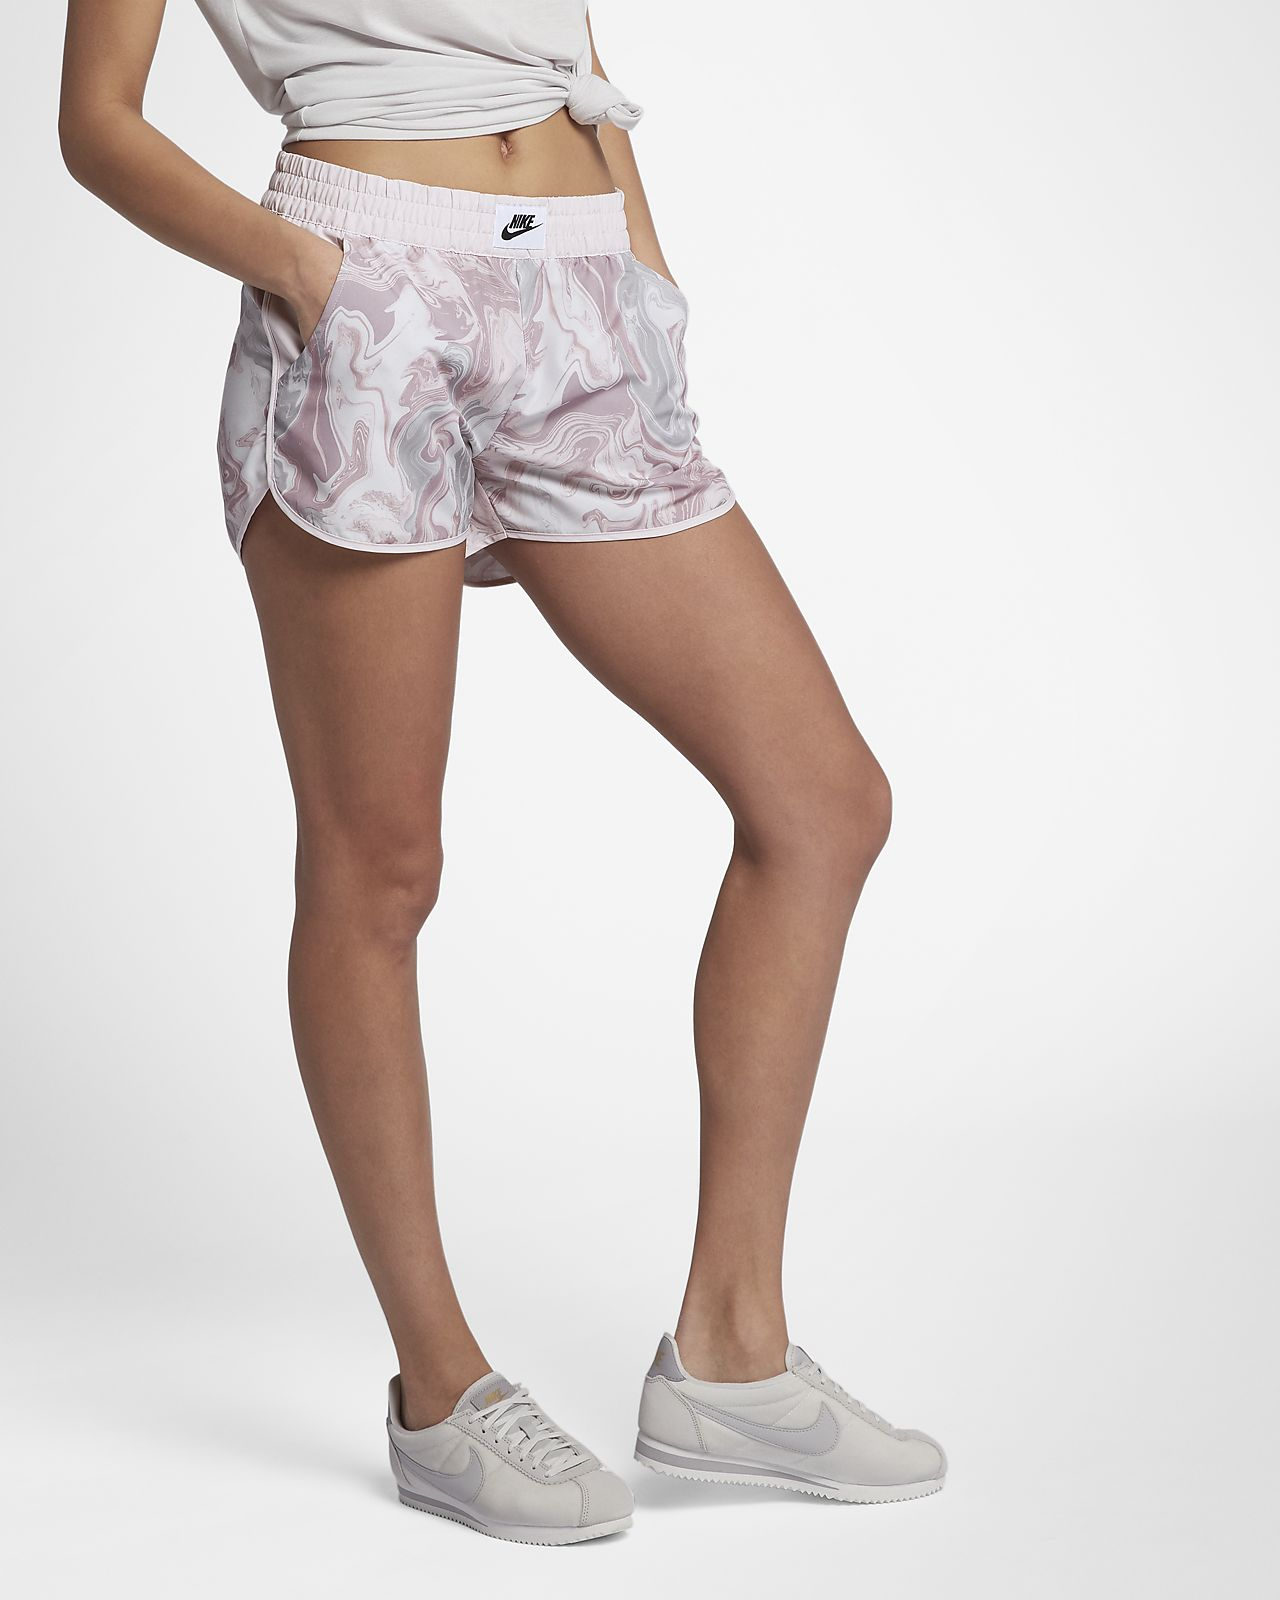 Nike FemmeMa Tissé Sportswear Imprimé Short Pour qMpSGLUzV